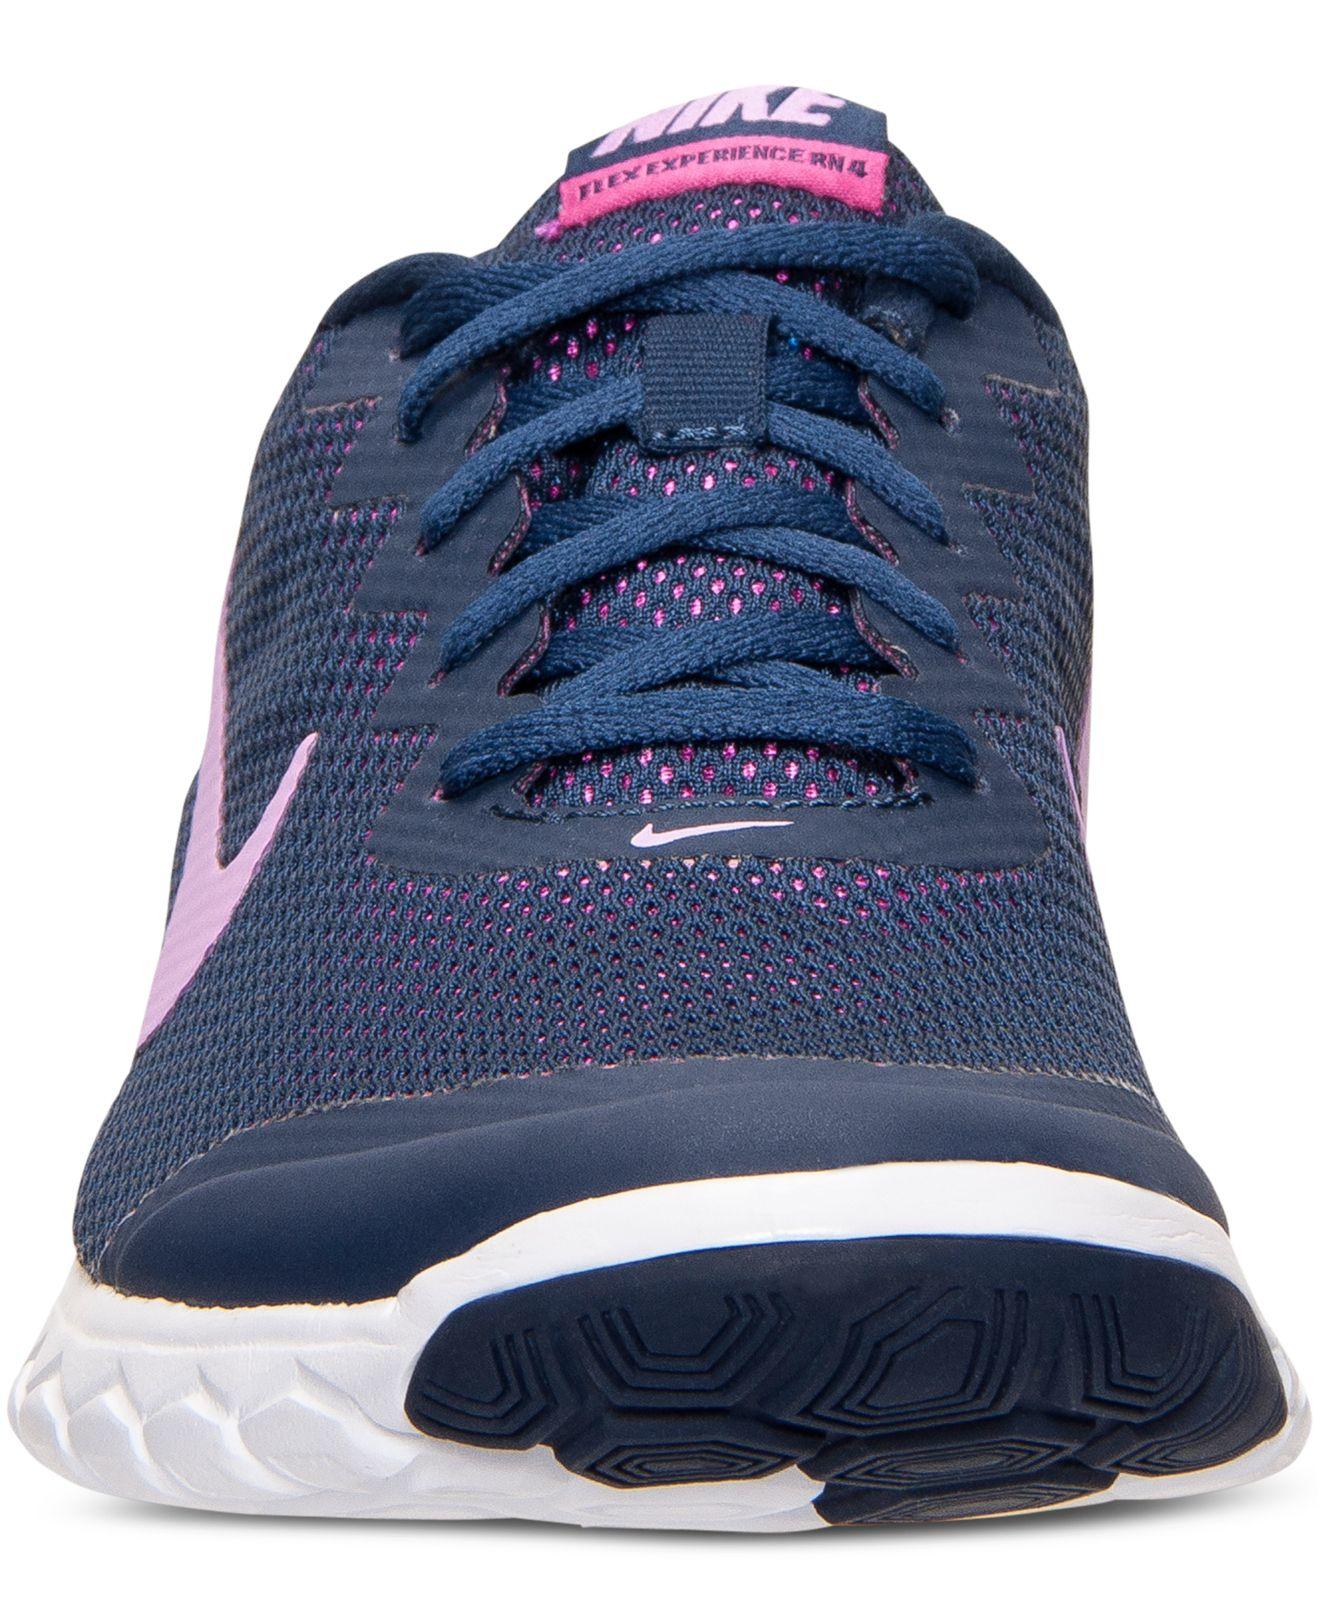 Lyst - Nike Women s Flex Experience Run 4 Running Sneakers From ... c773e81c2